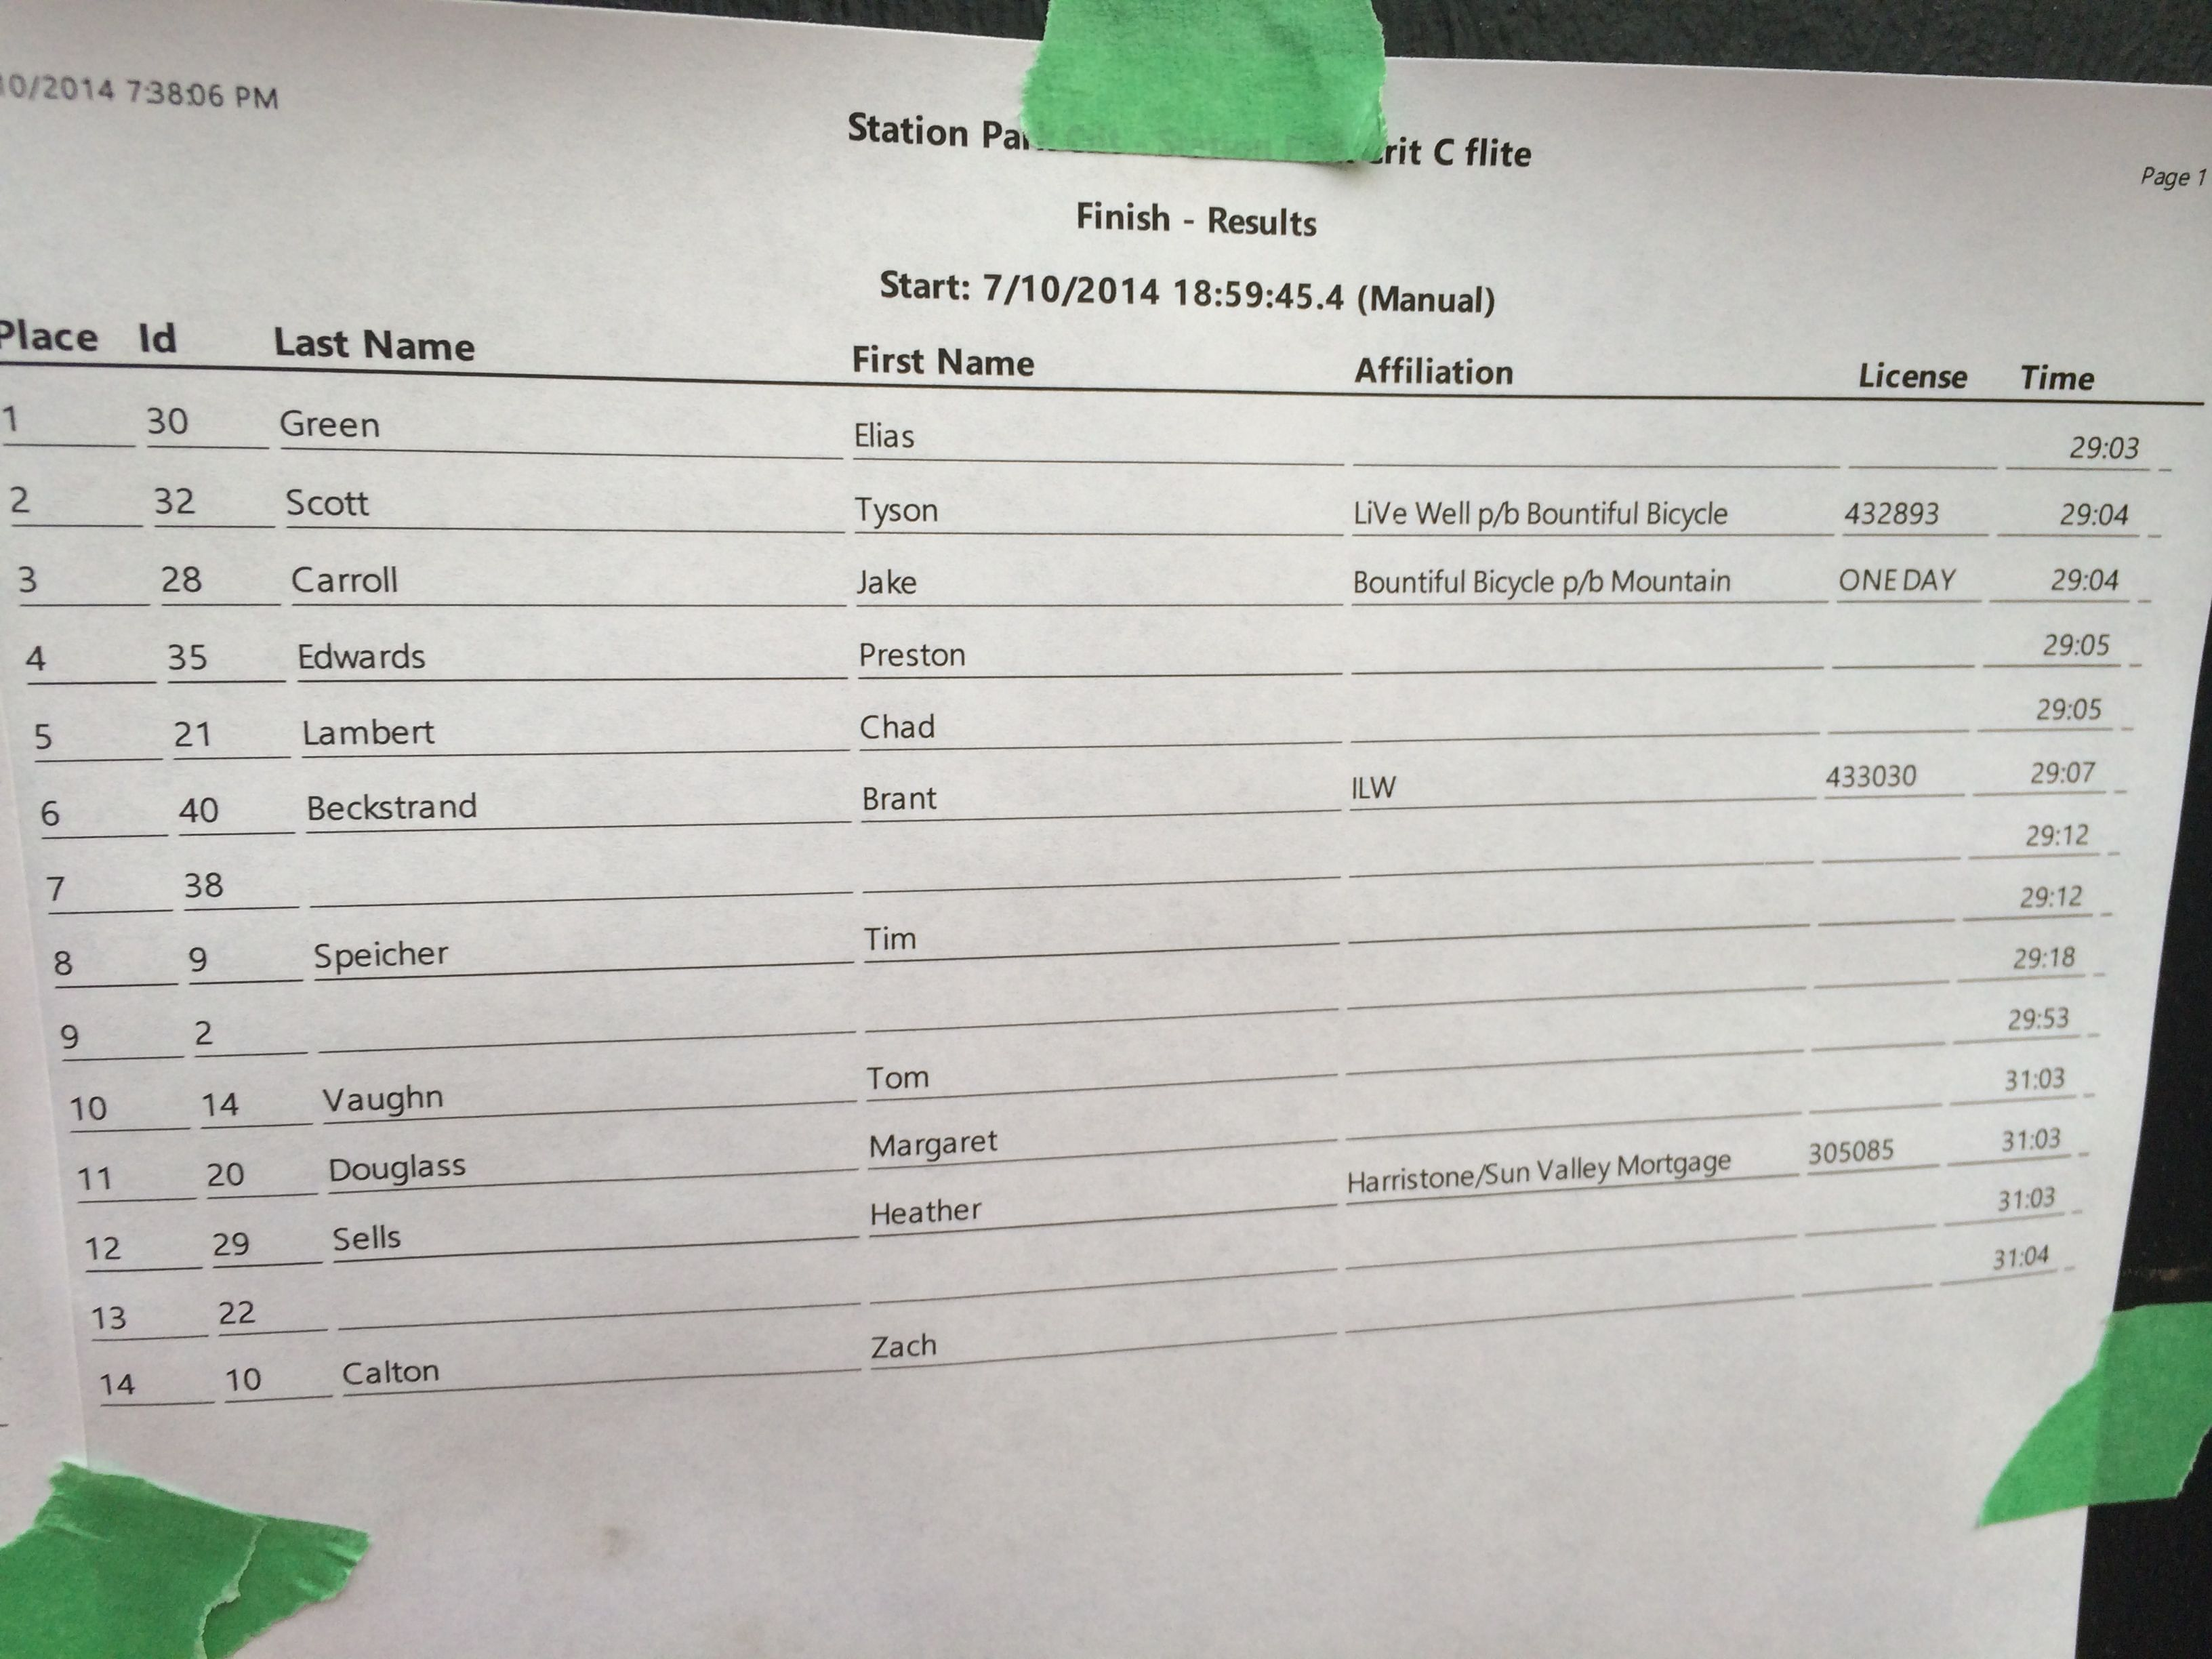 2014 Station Park Criterium B flite results